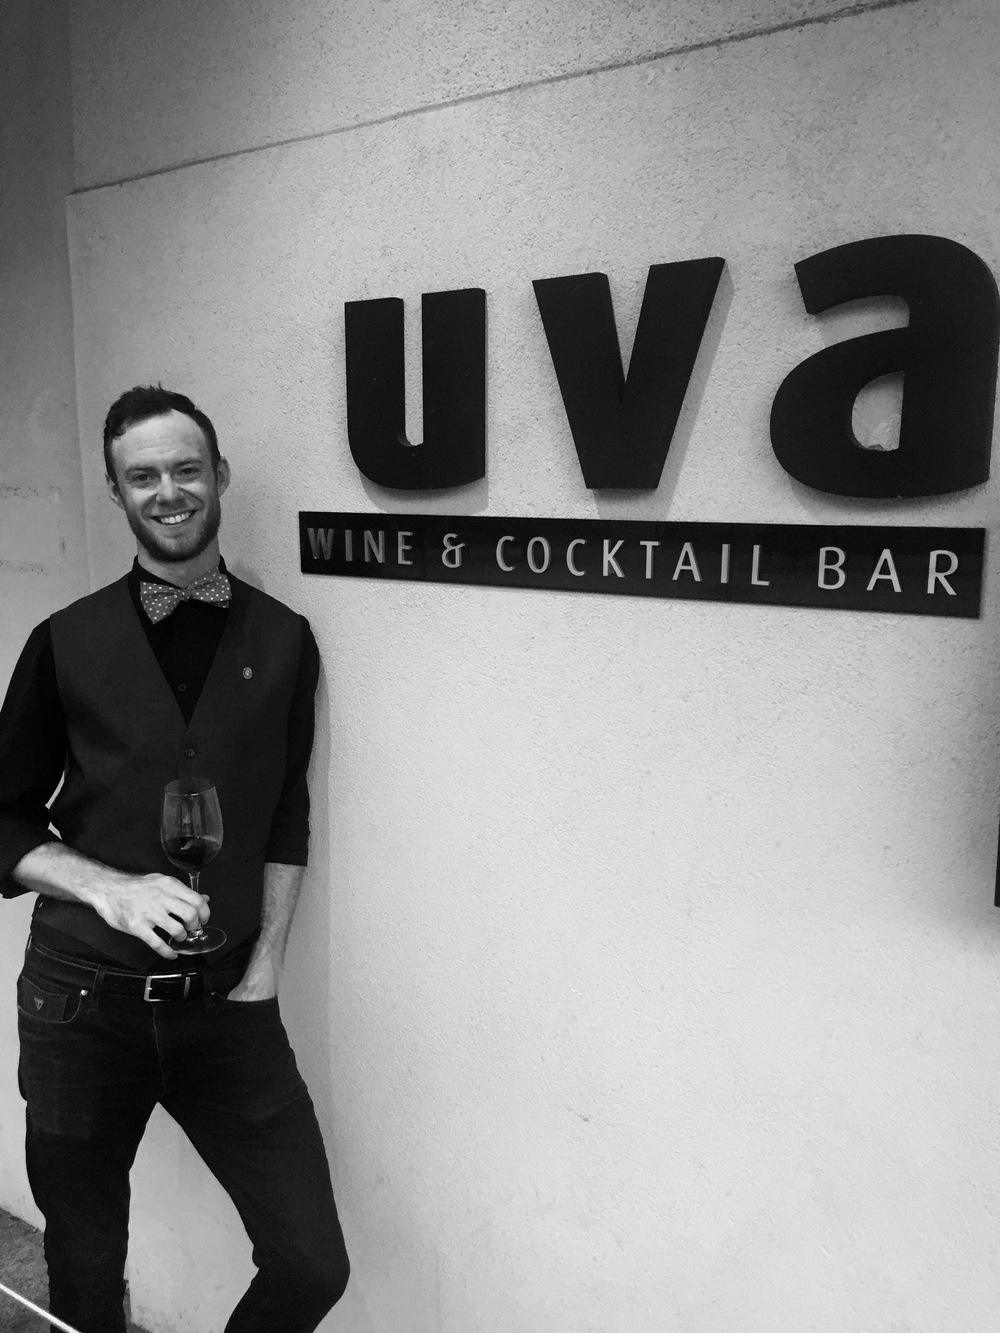 Uva Wine & Cocktail Bar